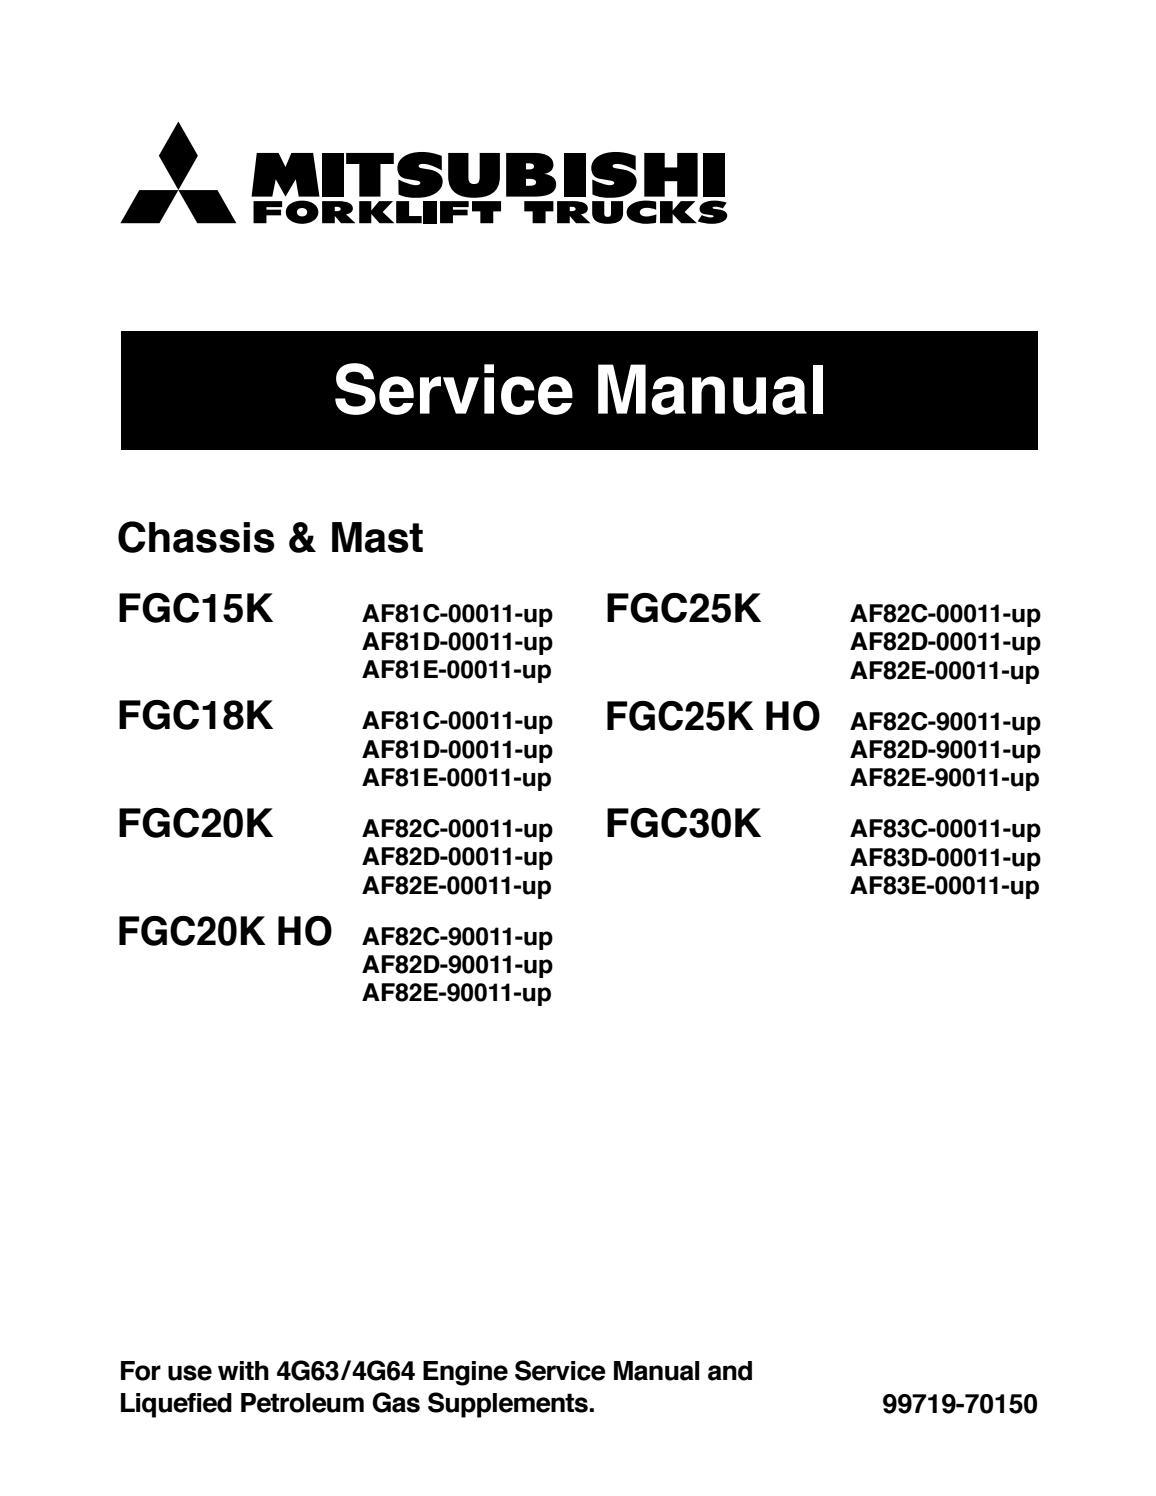 Mitsubishi Fgc18k Forklift Trucks Service Repair Manual Sn Af81c Hydraulic Control Valve Diagram Mast 00011 Up By 16326108 Issuu